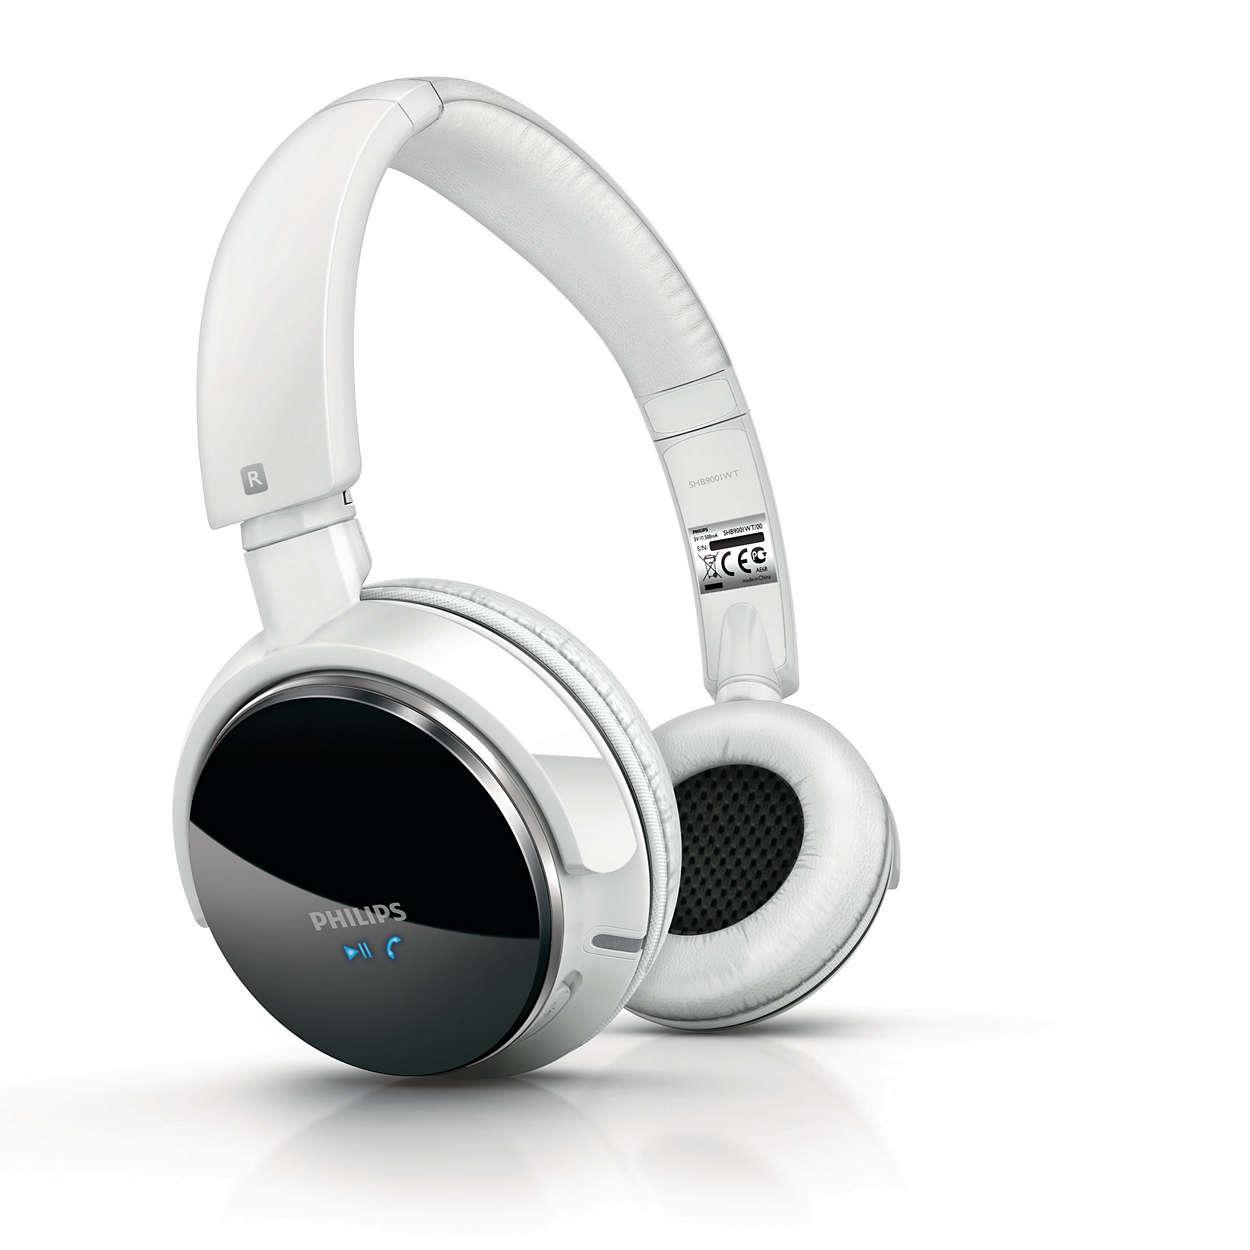 Ultieme draadloze audiokwaliteit